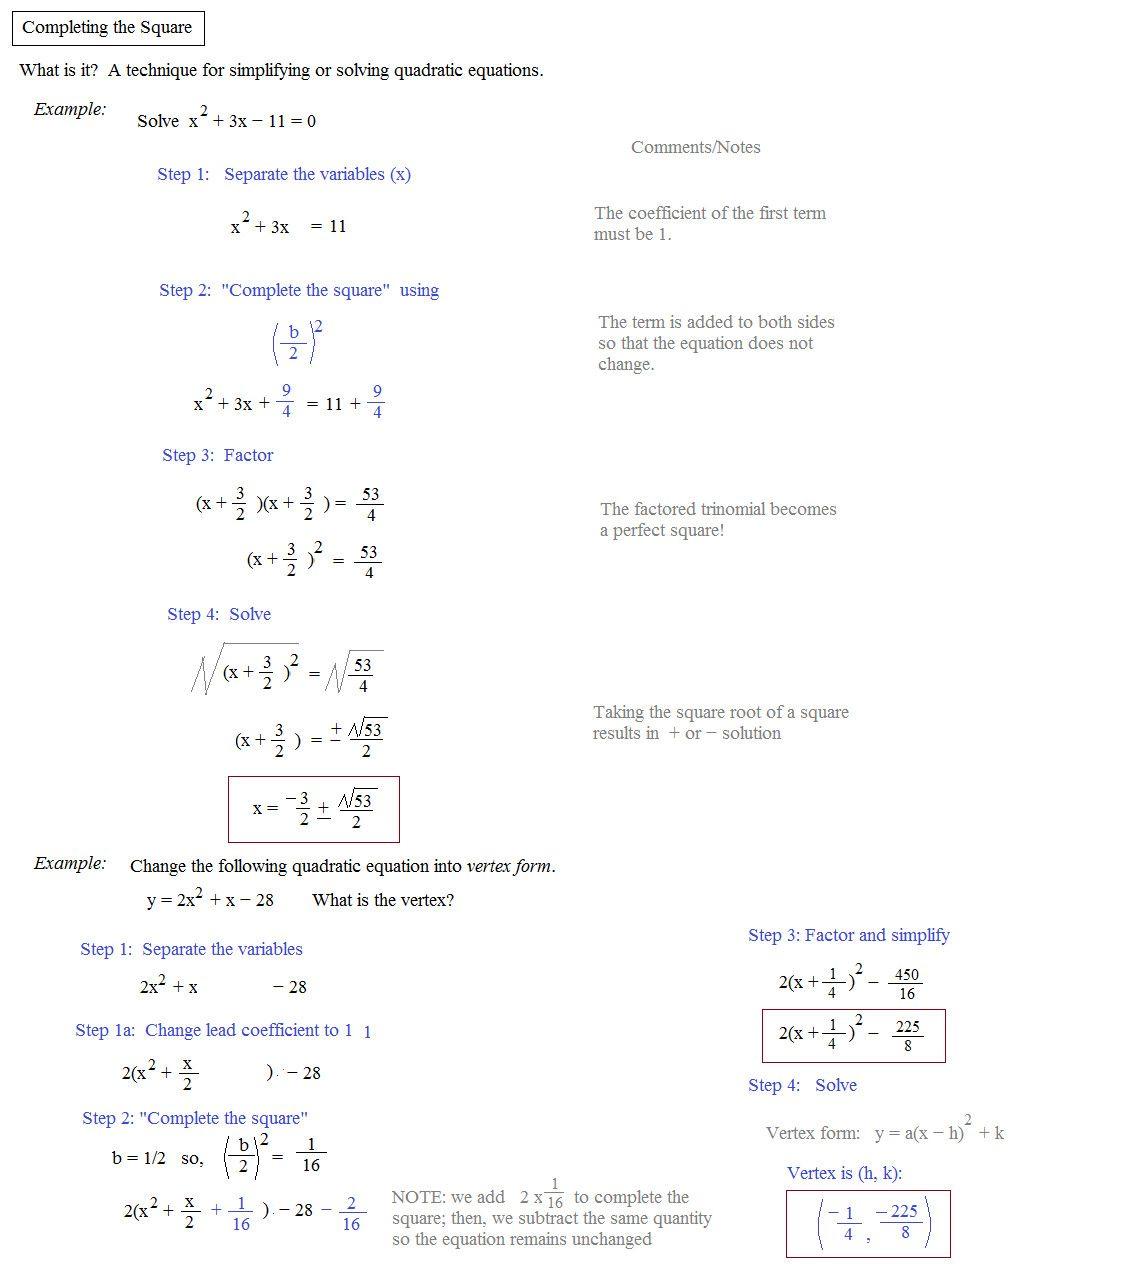 Complete The Square Worksheet In 2020 Quadratics Solving Quadratic Equations Quadratic Formula